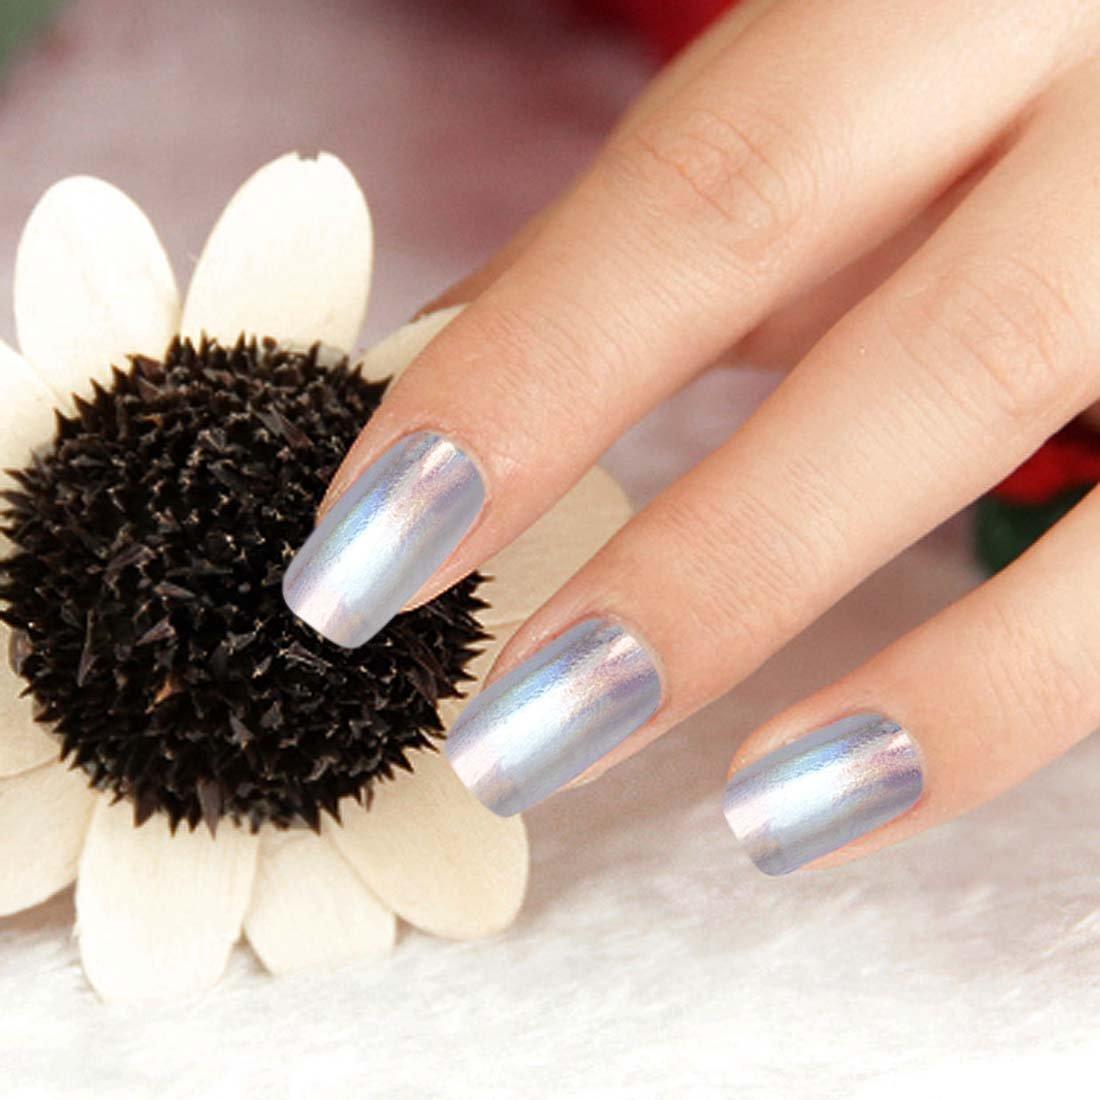 Amazon.com : bmc 24pc silver colored holographic foil design nail polish art decal effect sticker wrap strips : beauty